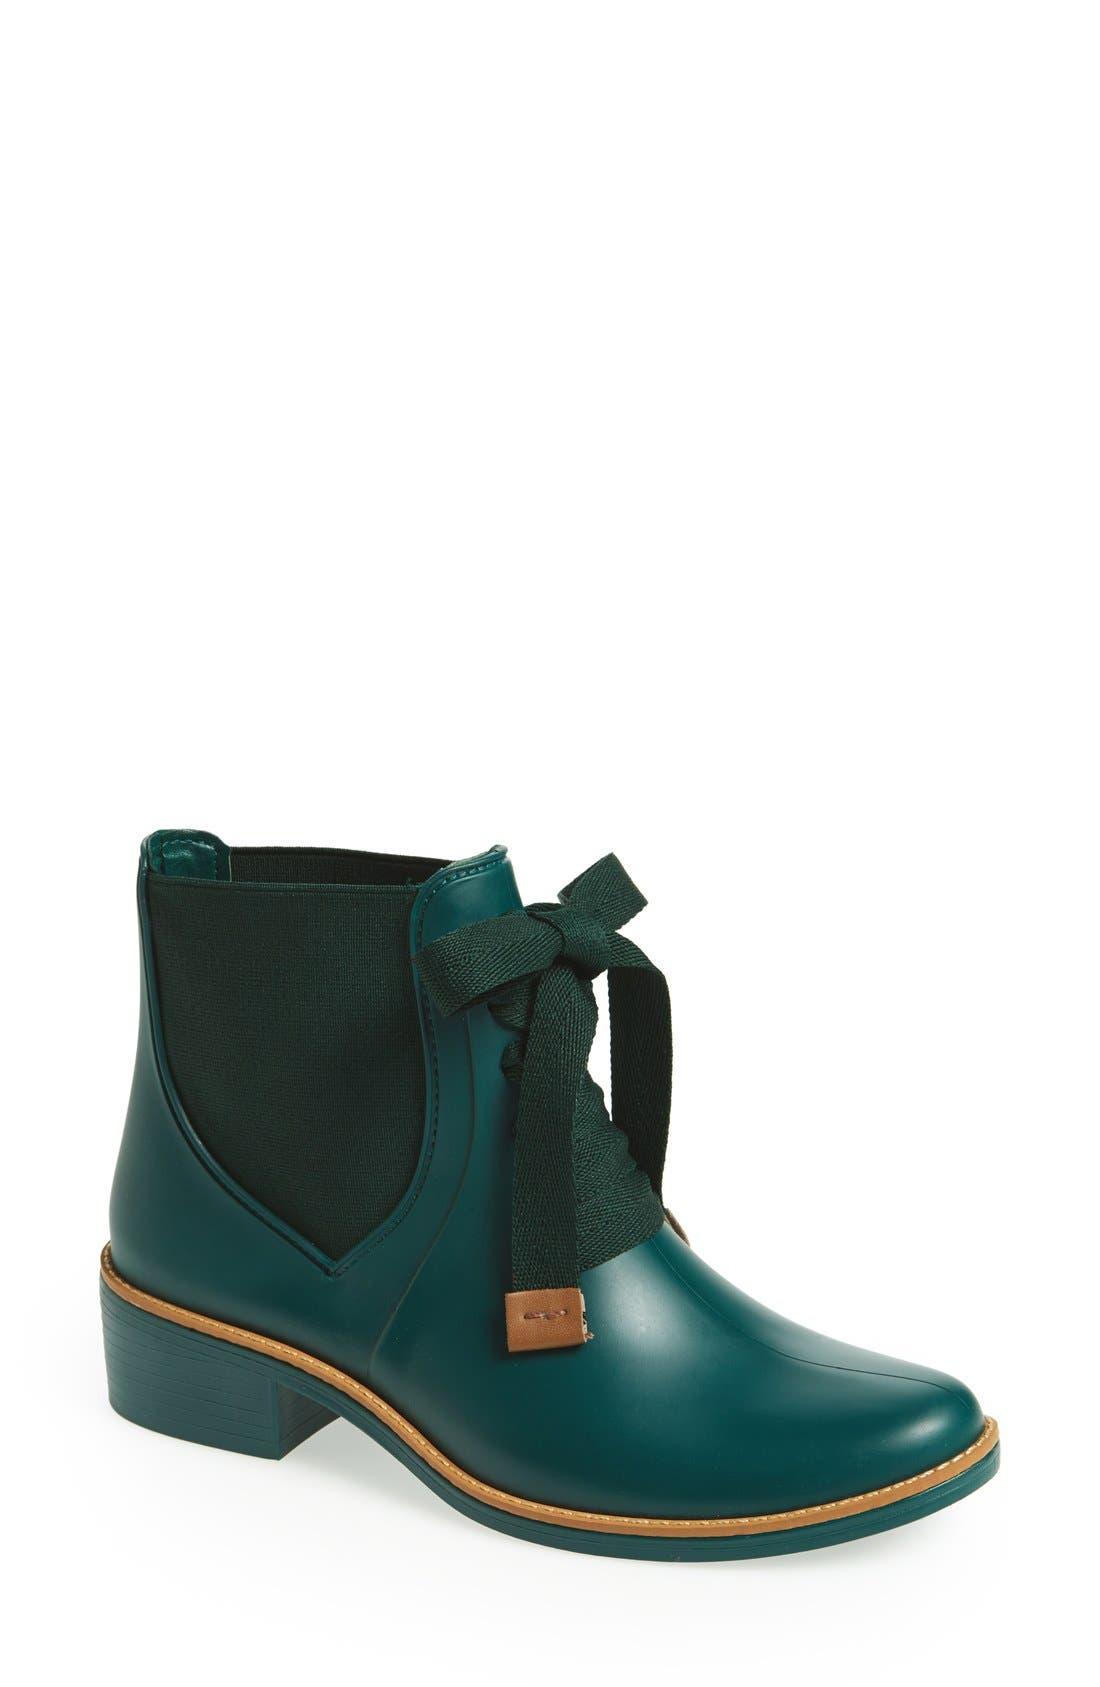 Main Image - Bernardo Lacey Short Waterproof Rain Boot (Women)